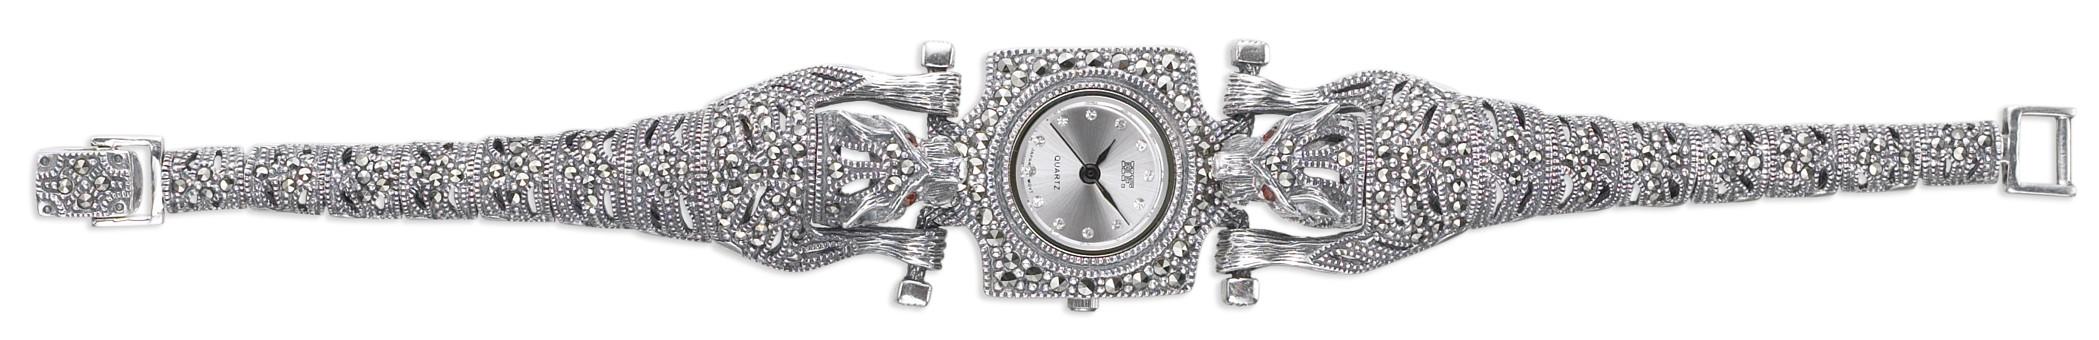 marcasite-watch-HW008